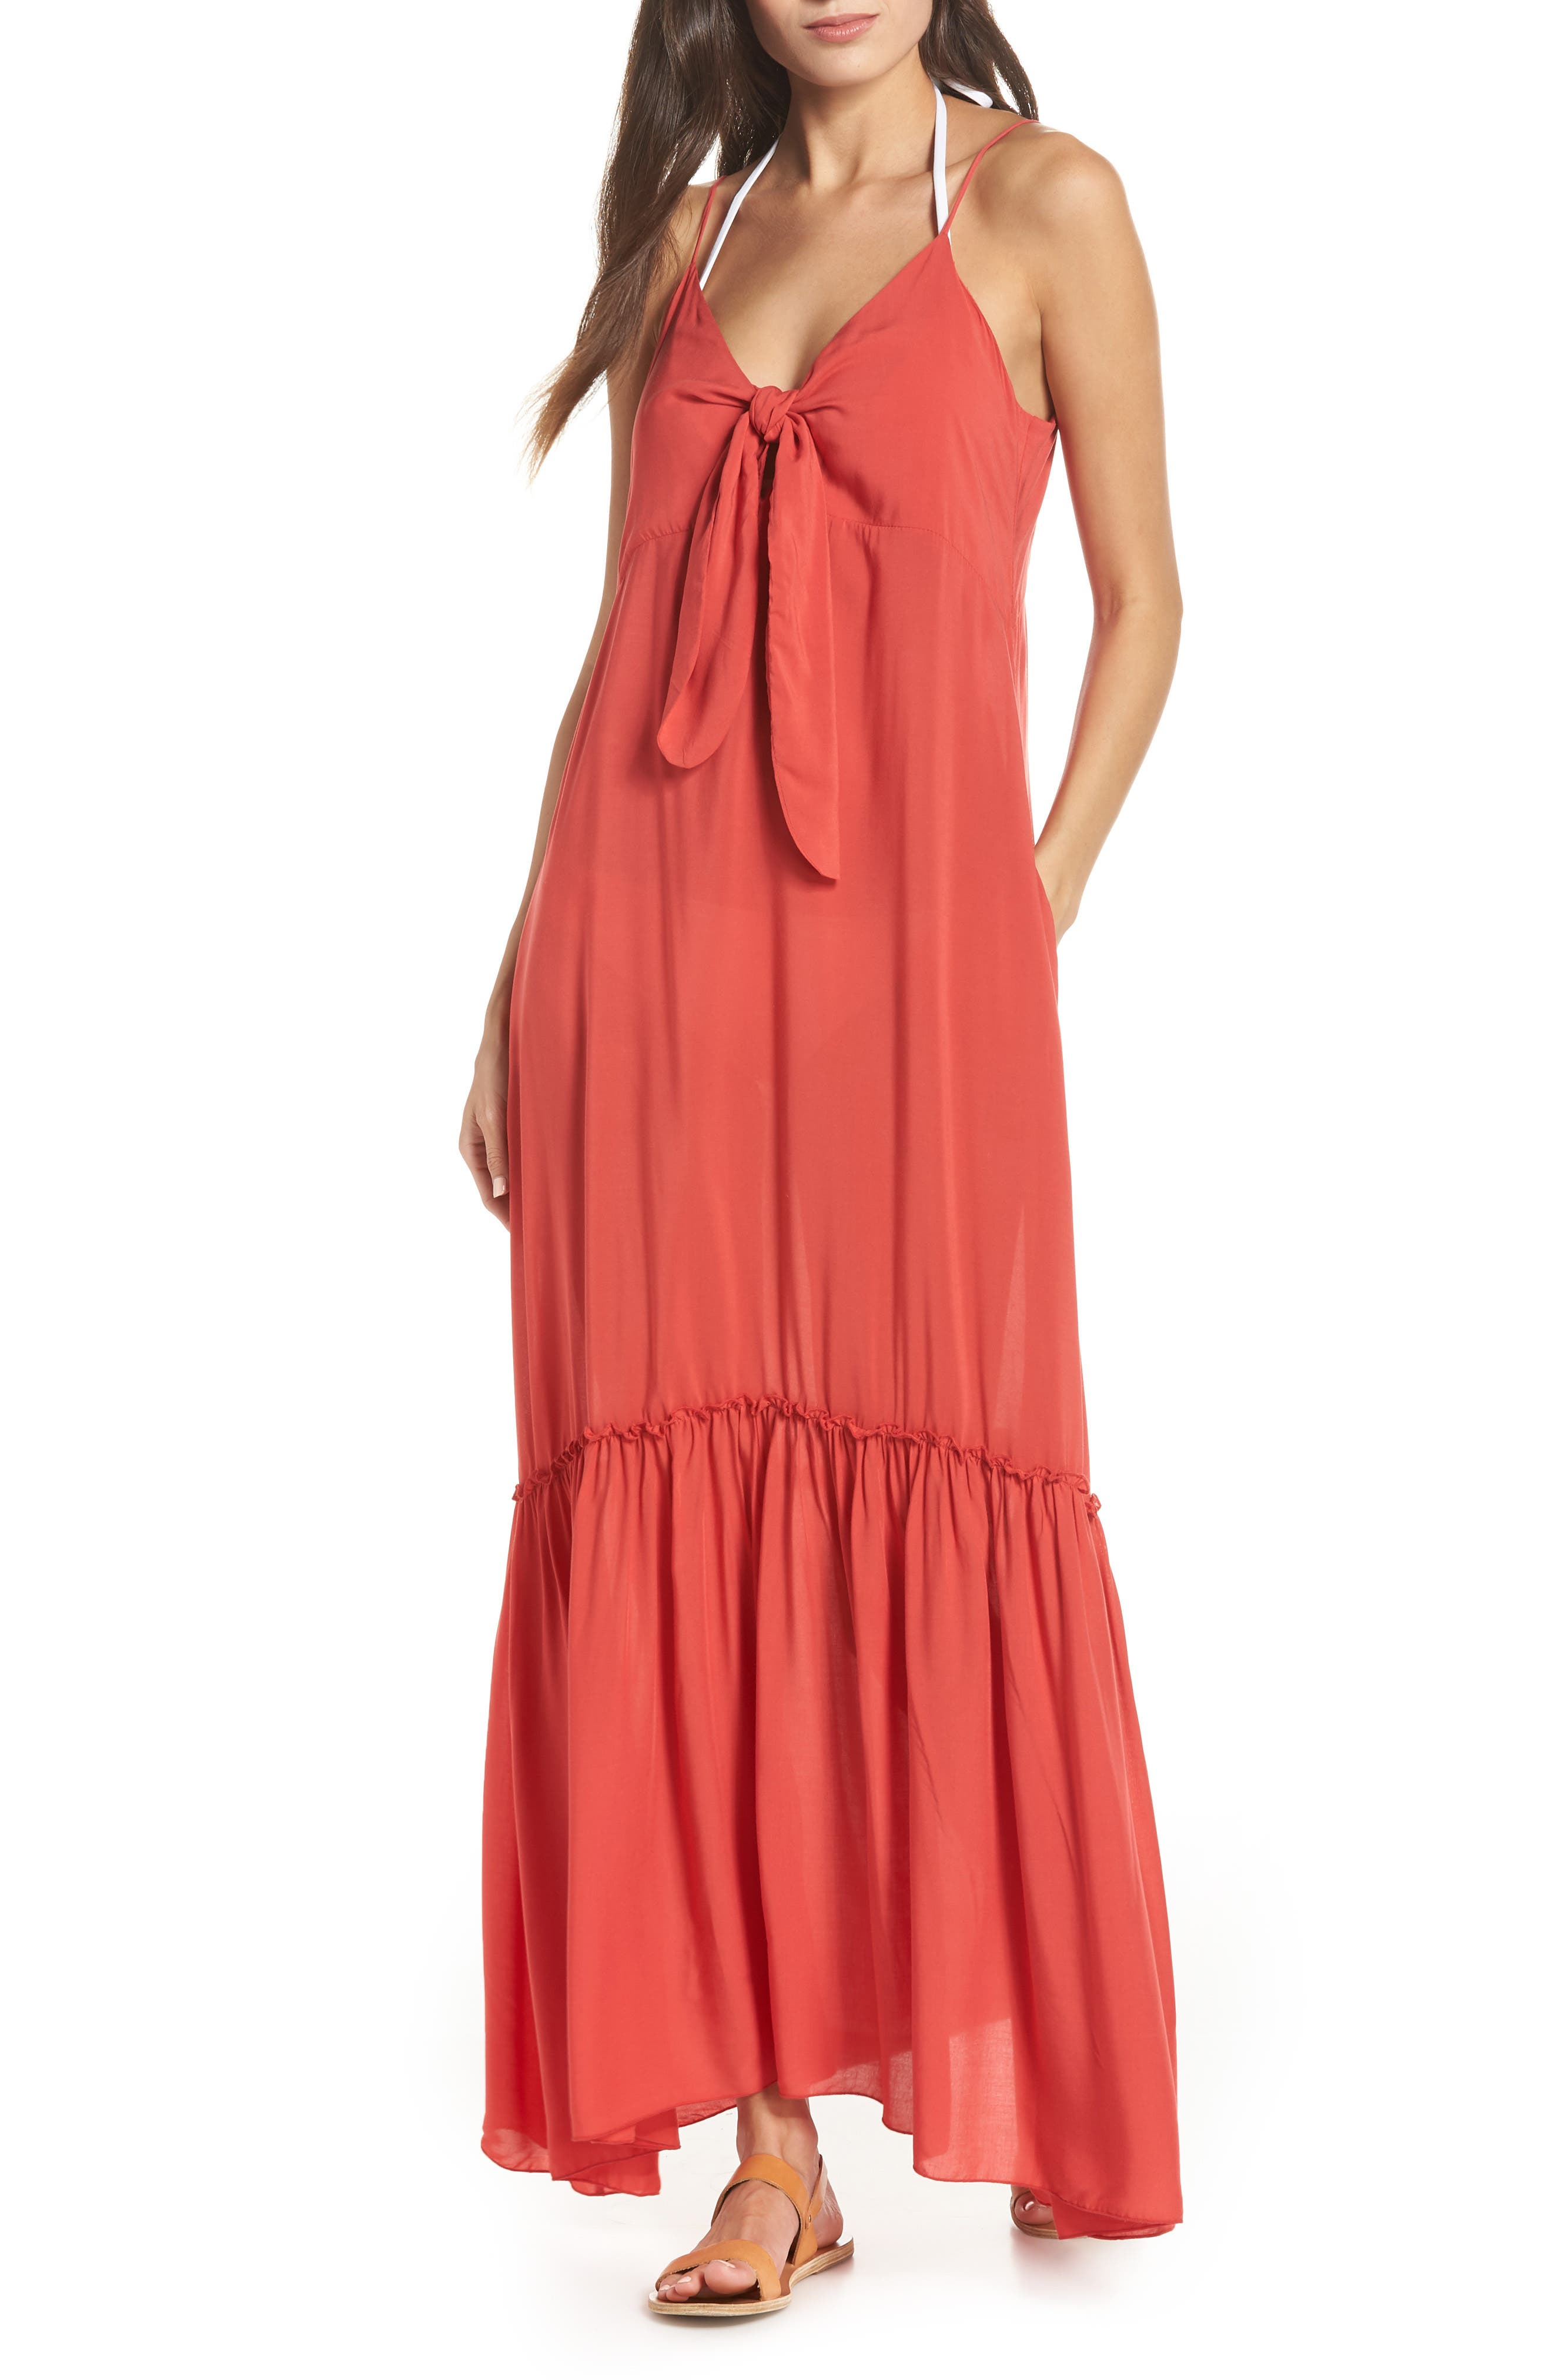 Elan Maxi Cover-Up Dress, Coral